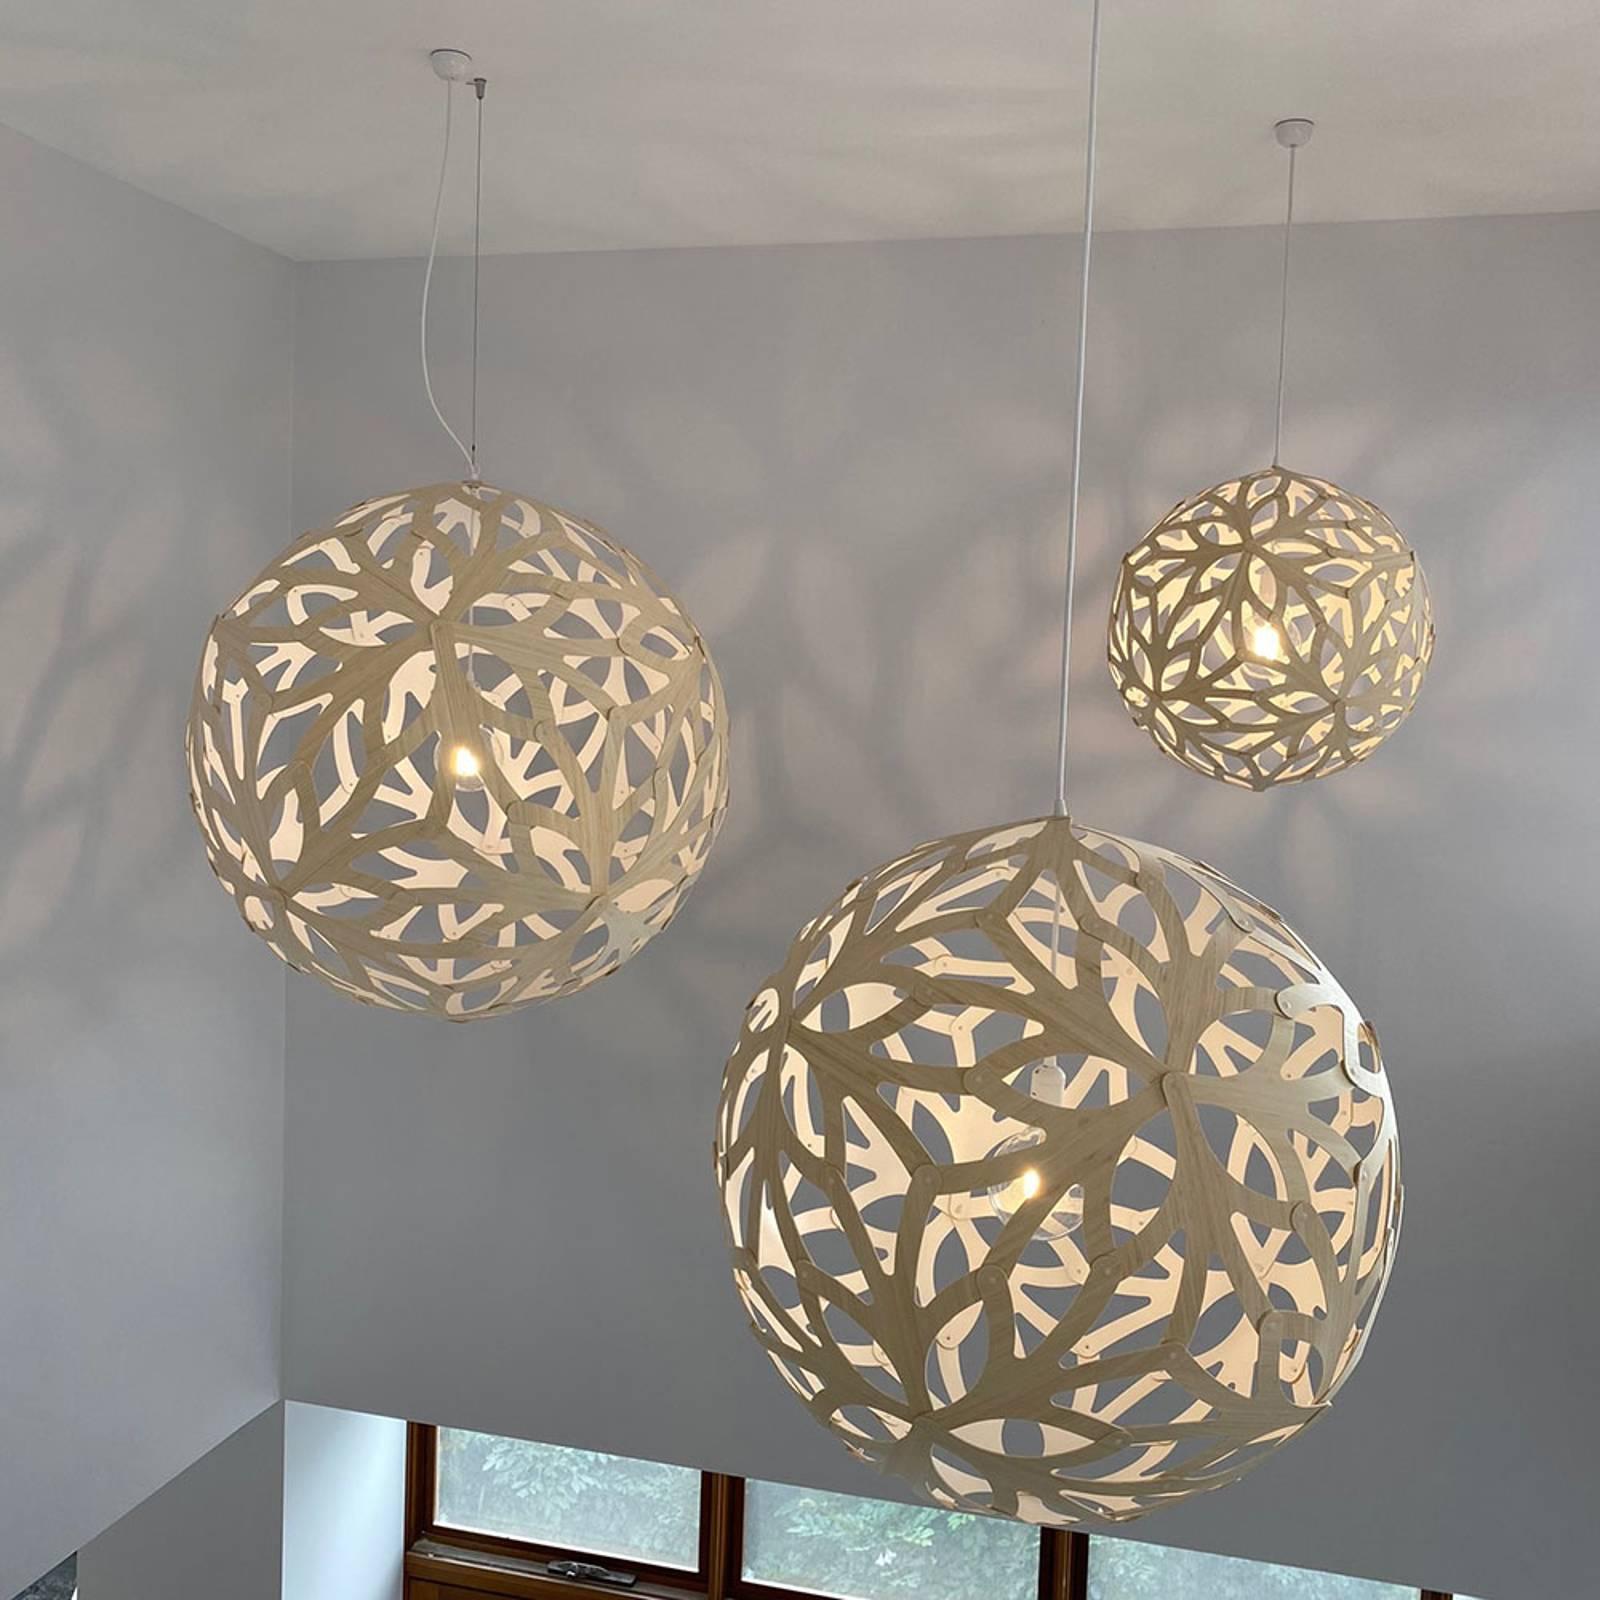 david trubridge Floral lampa wisząca Ø 80cm